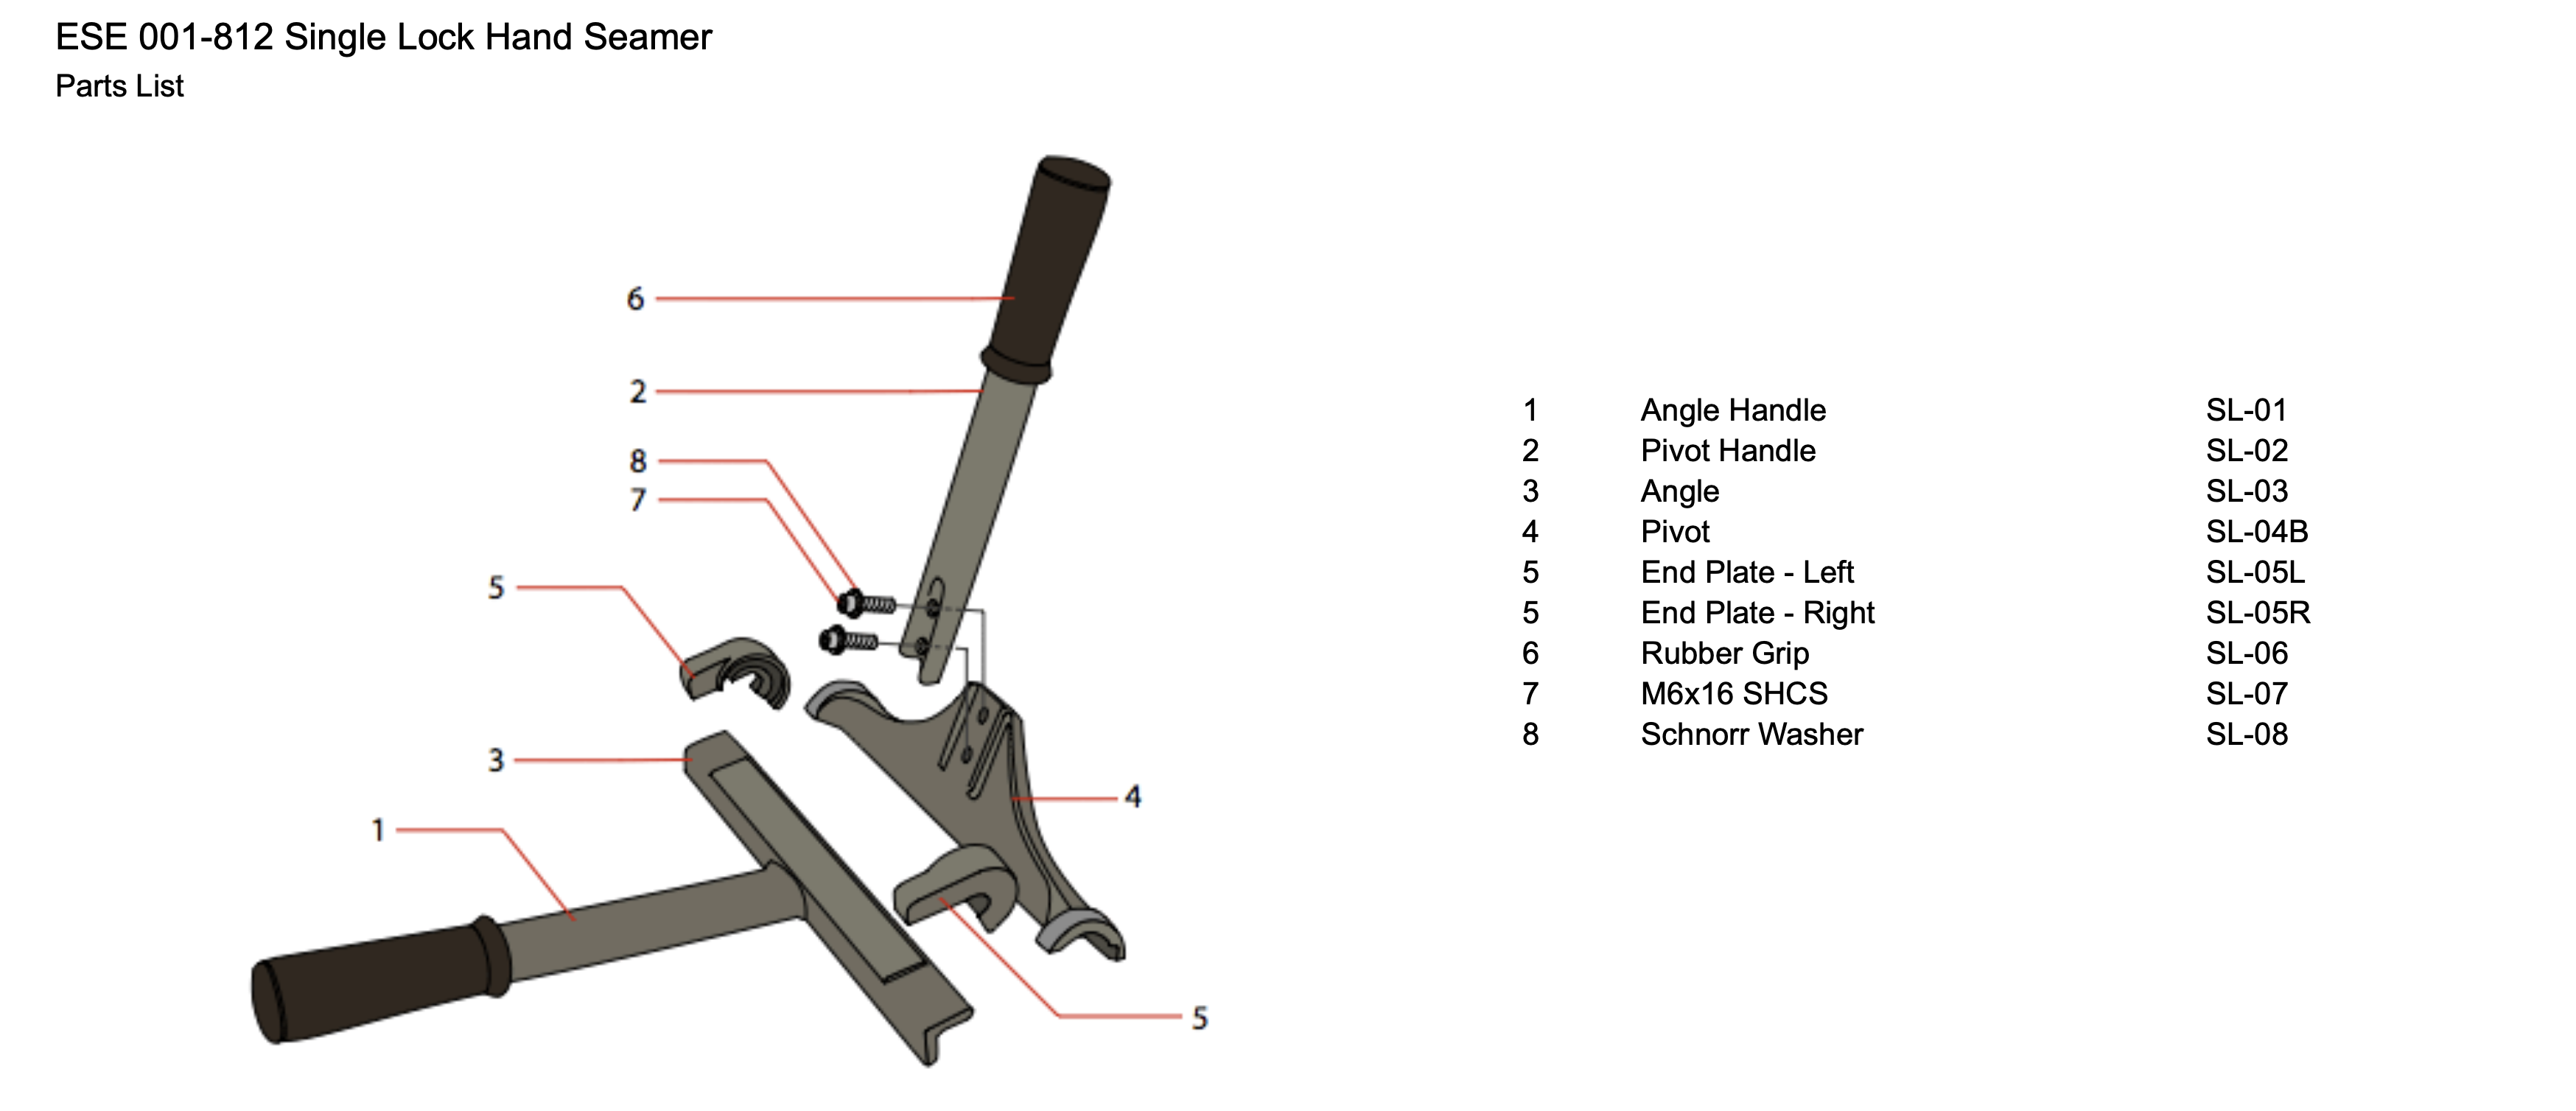 ese-001-812-single-lock-hand-seamer